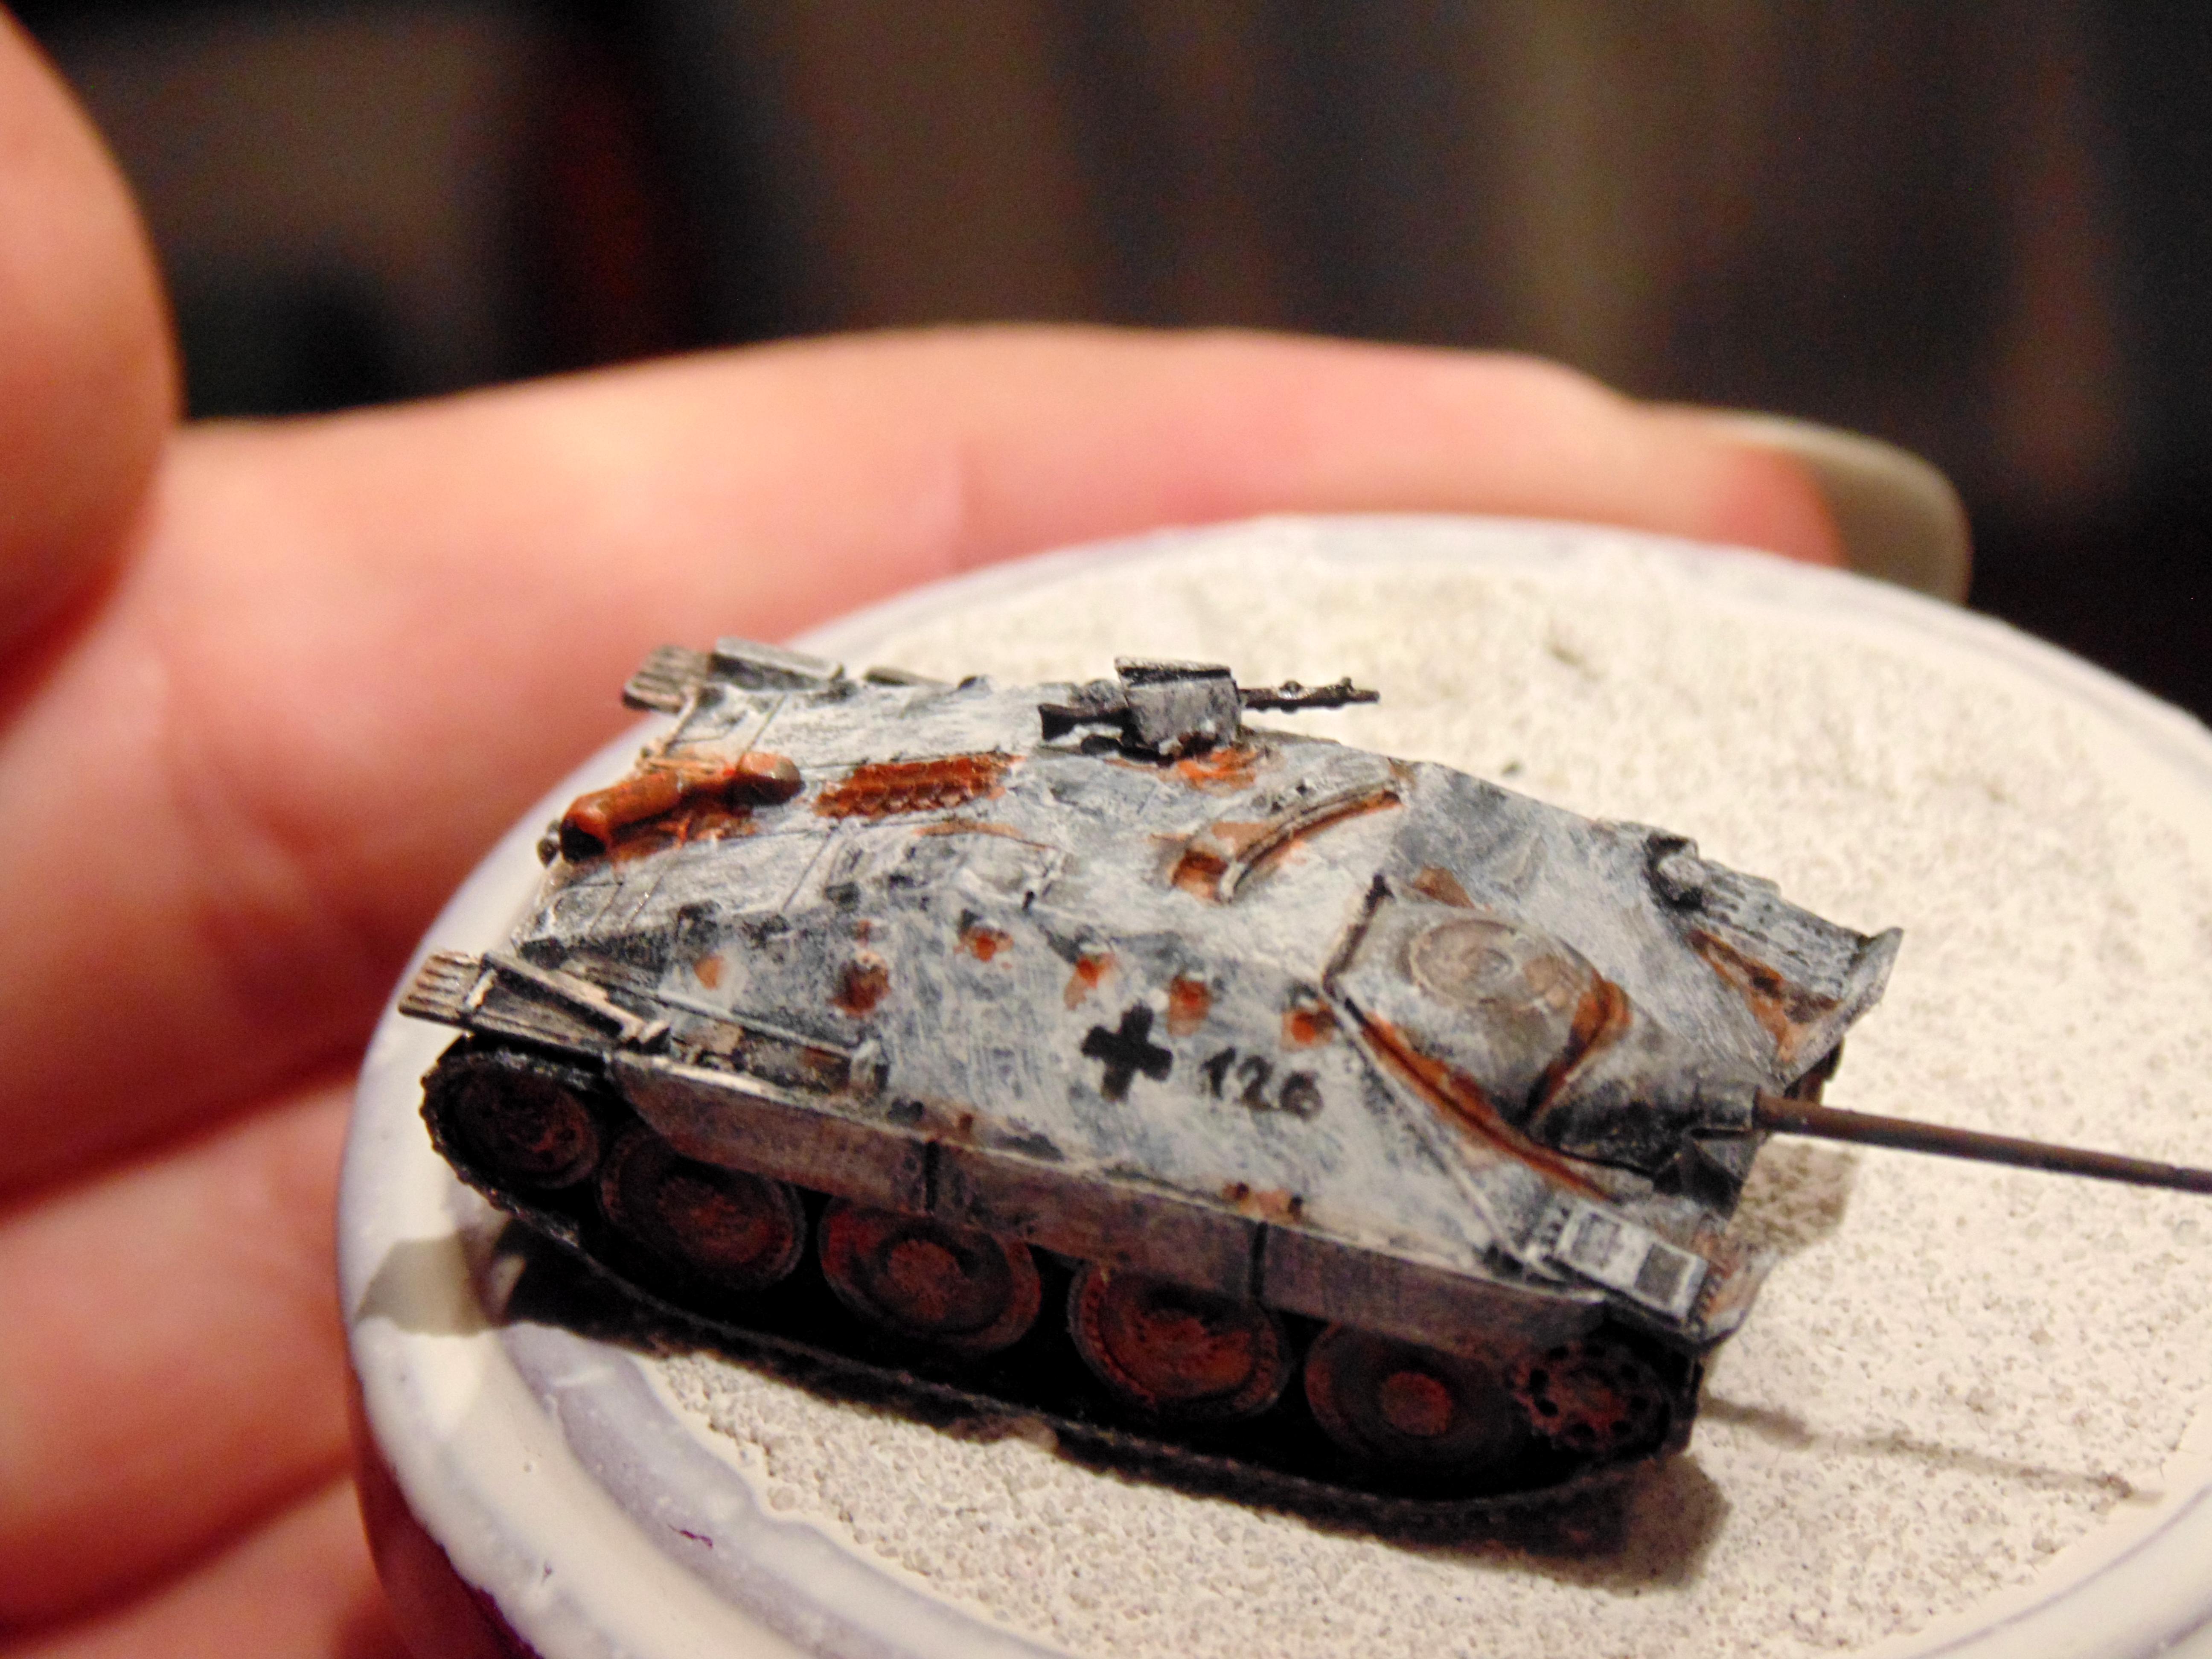 Germans, Hetzer, Mechanic, Panther, Panzer, Russians, Sherman, Tank, Tiger, World War 2